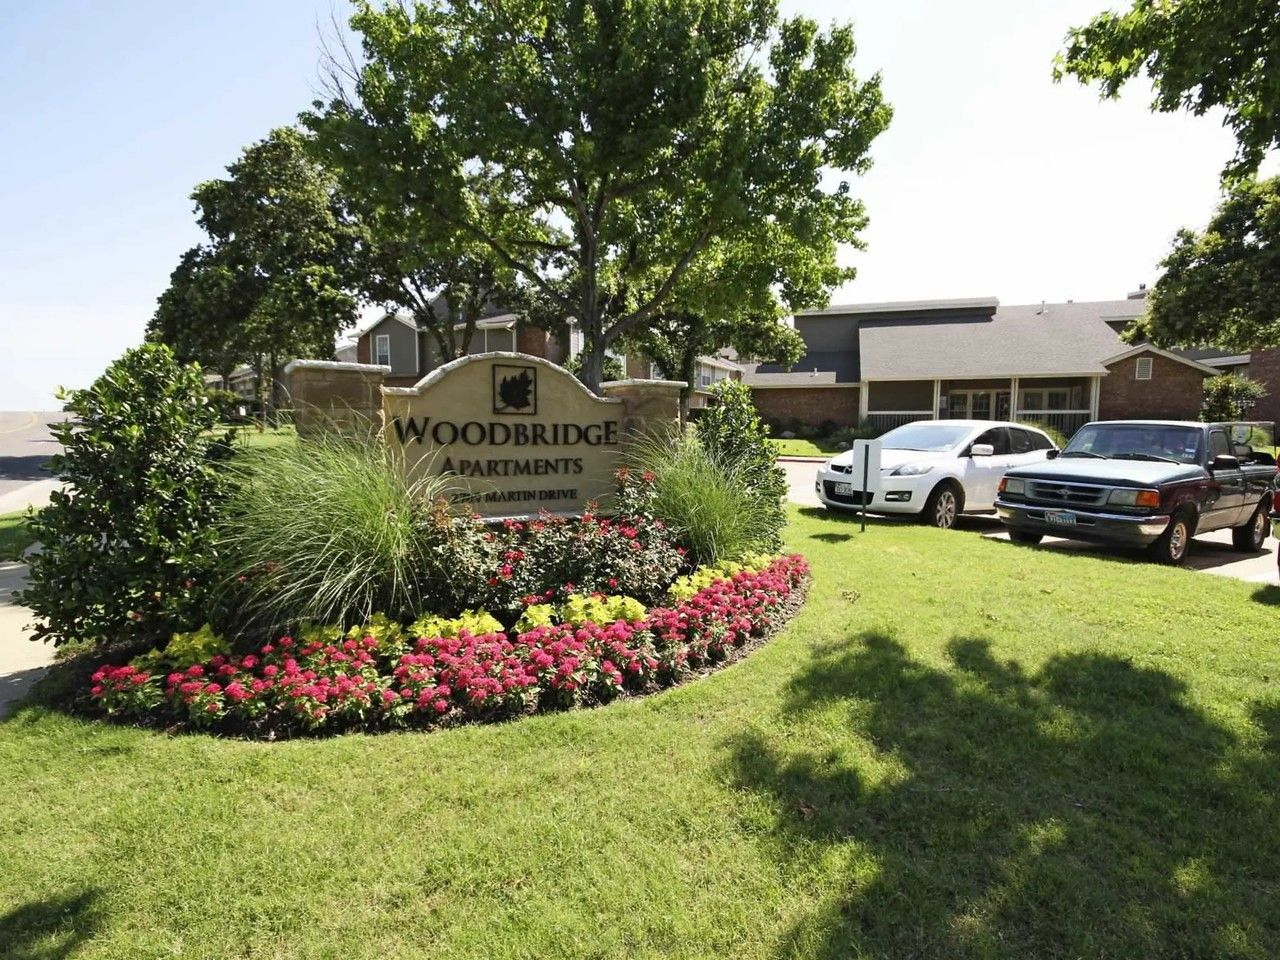 Woodbridge Apartments for Rent - 2700 Martin Drive ...